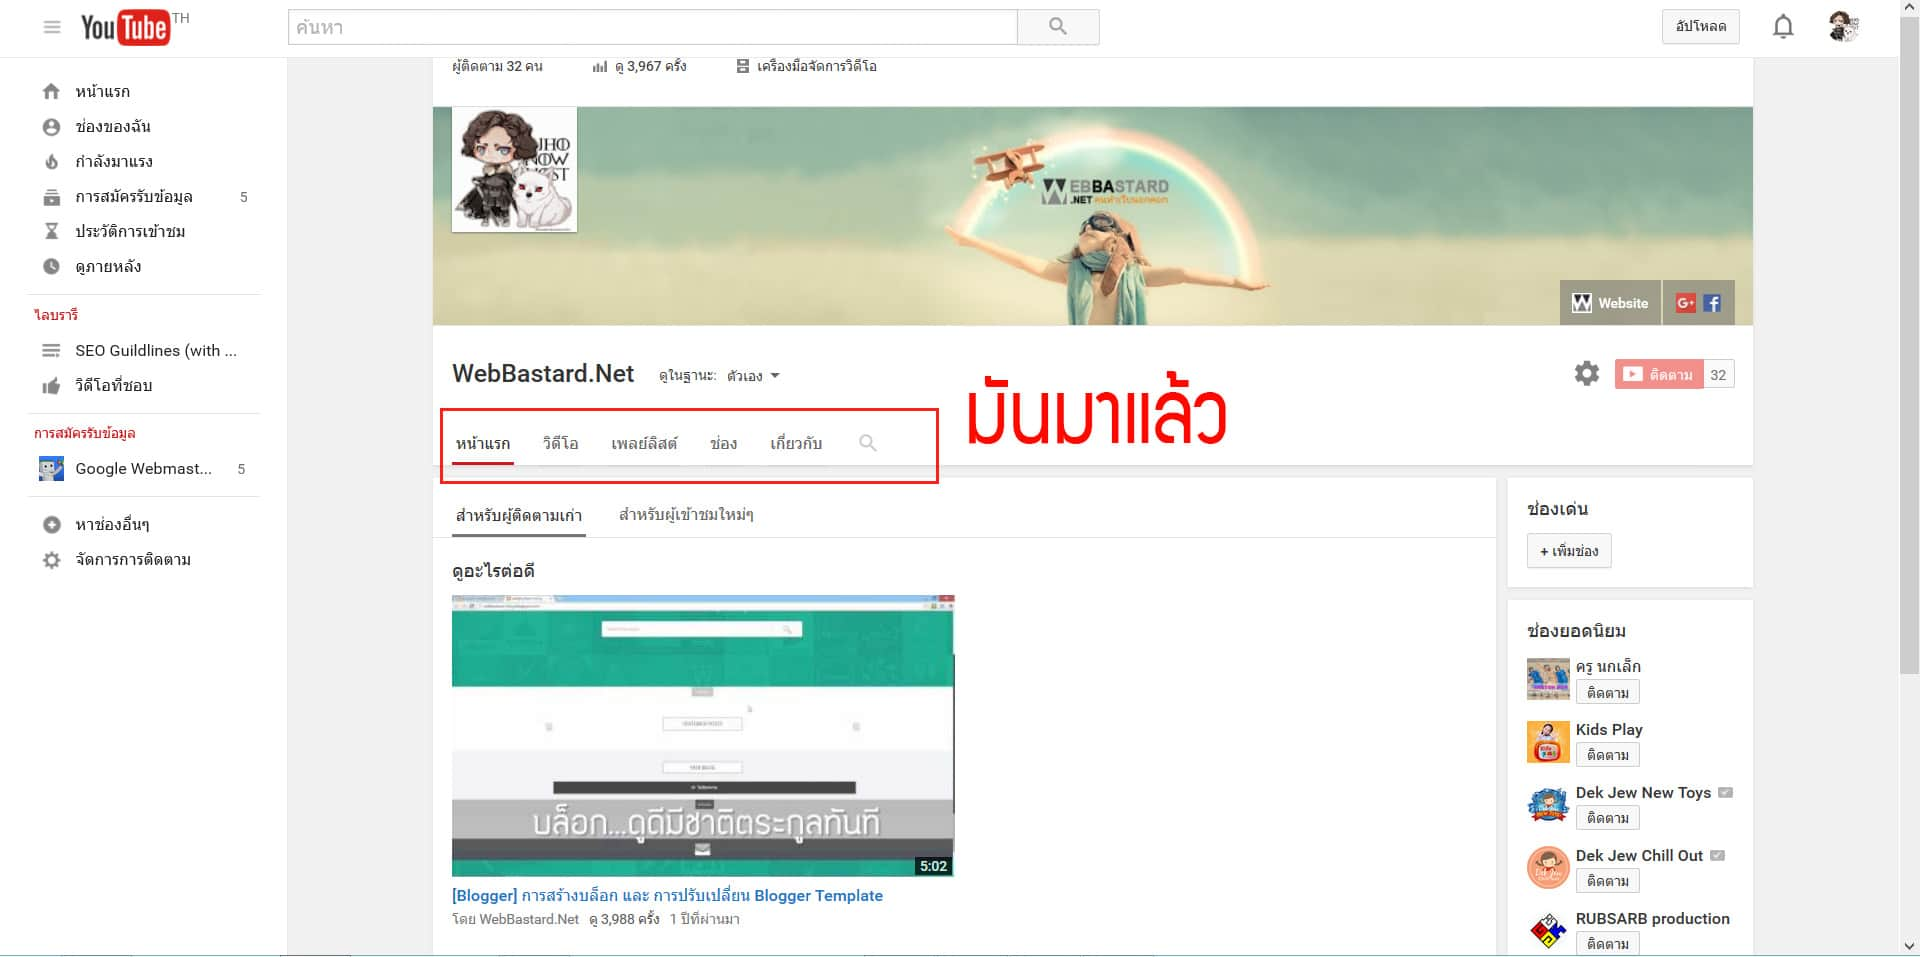 add-link-youtube-channel-02